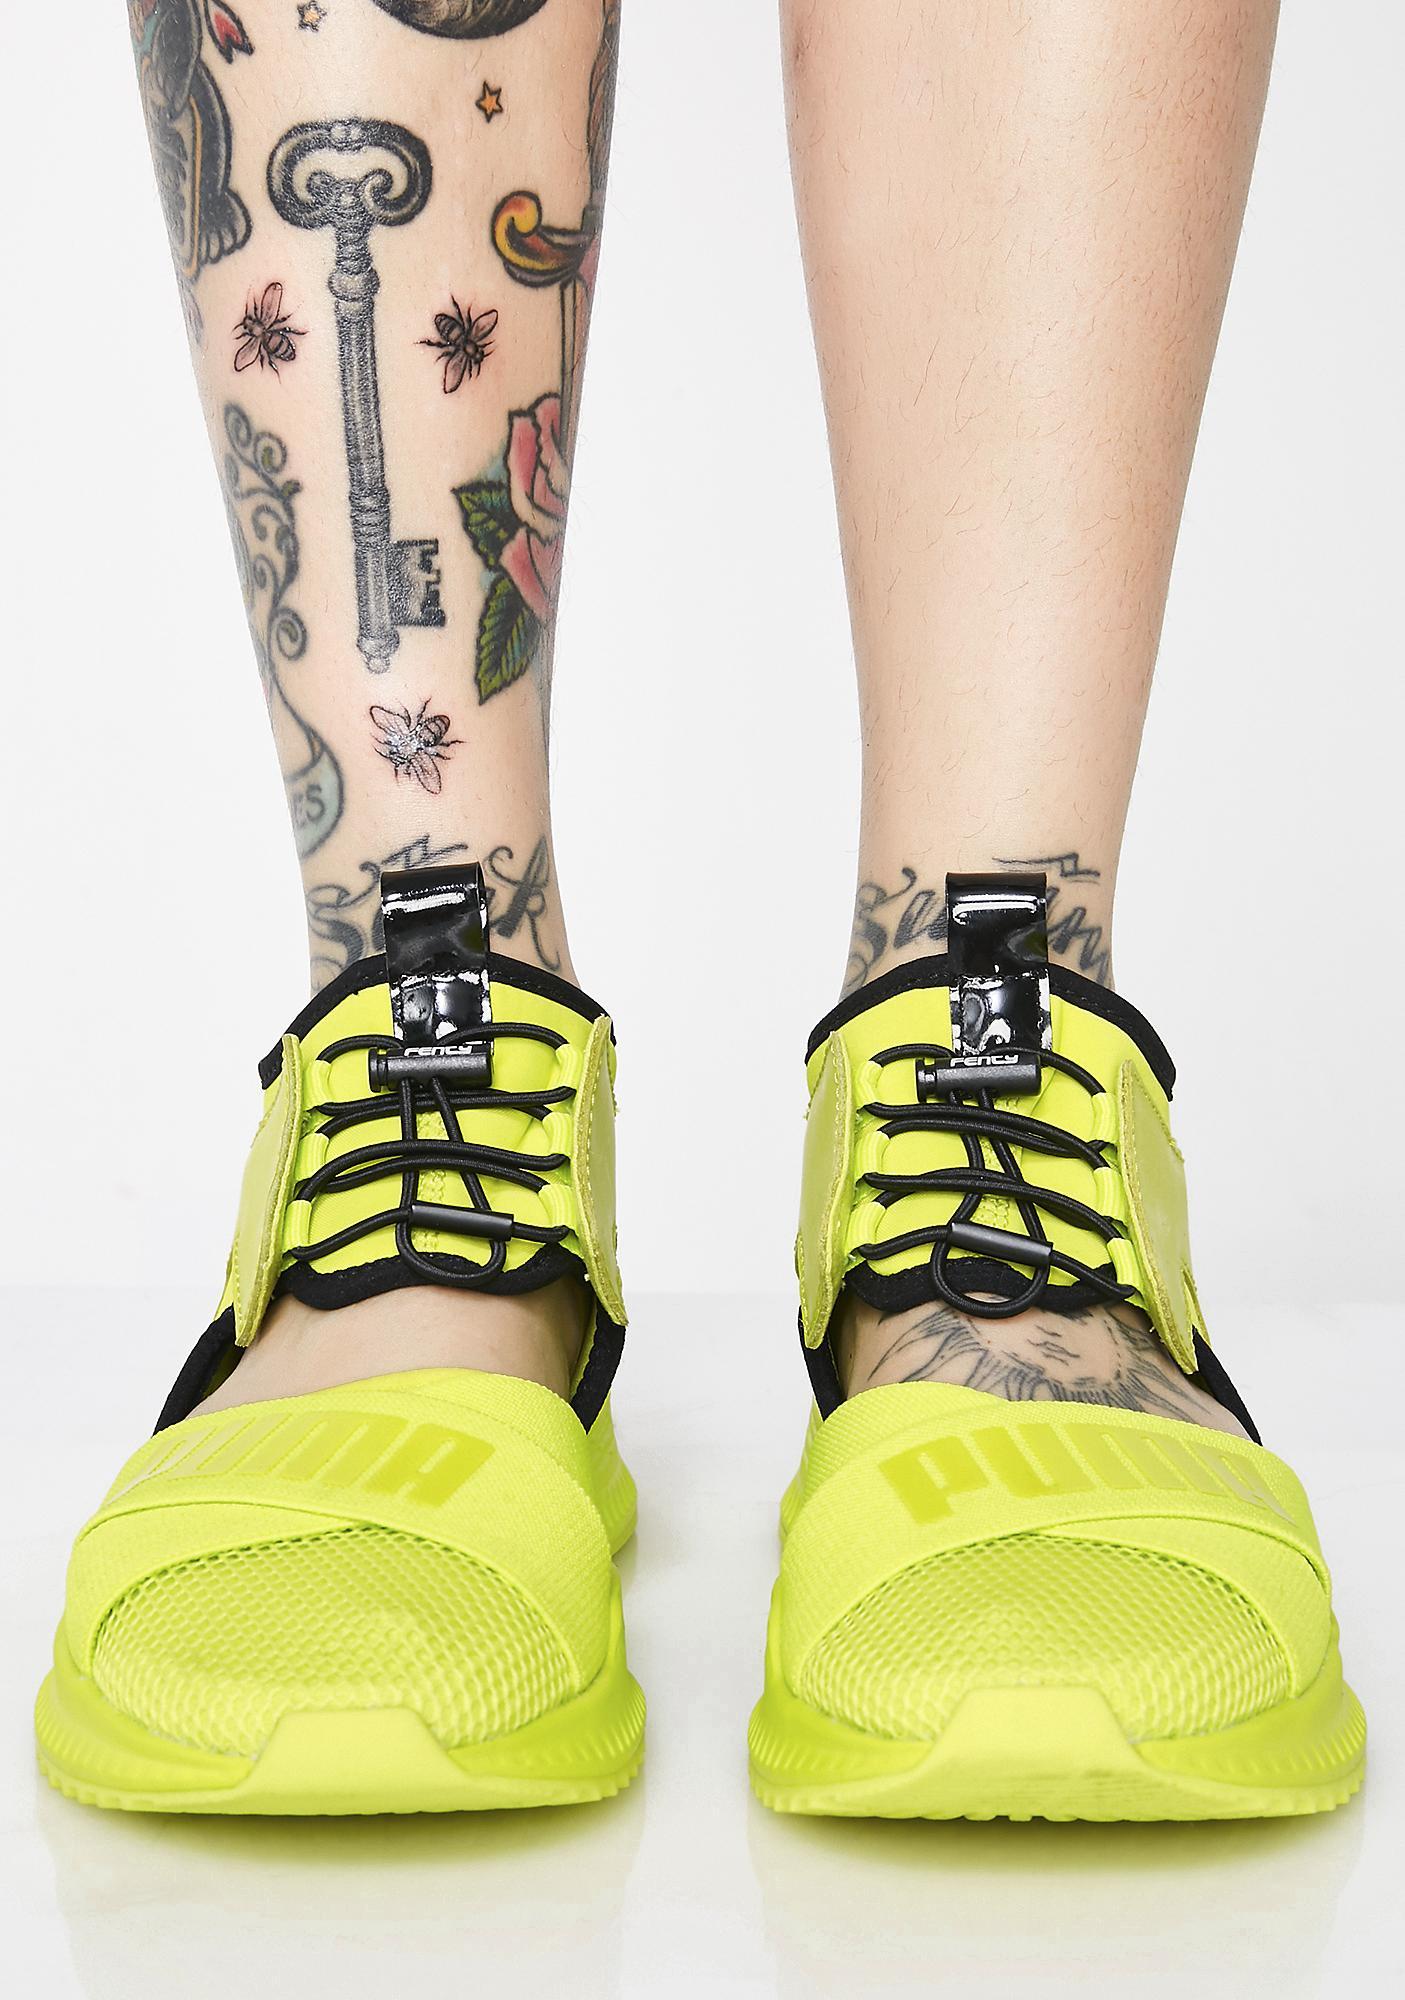 separation shoes 278d1 1b207 FENTY PUMA By Rihanna Avid Sneakers